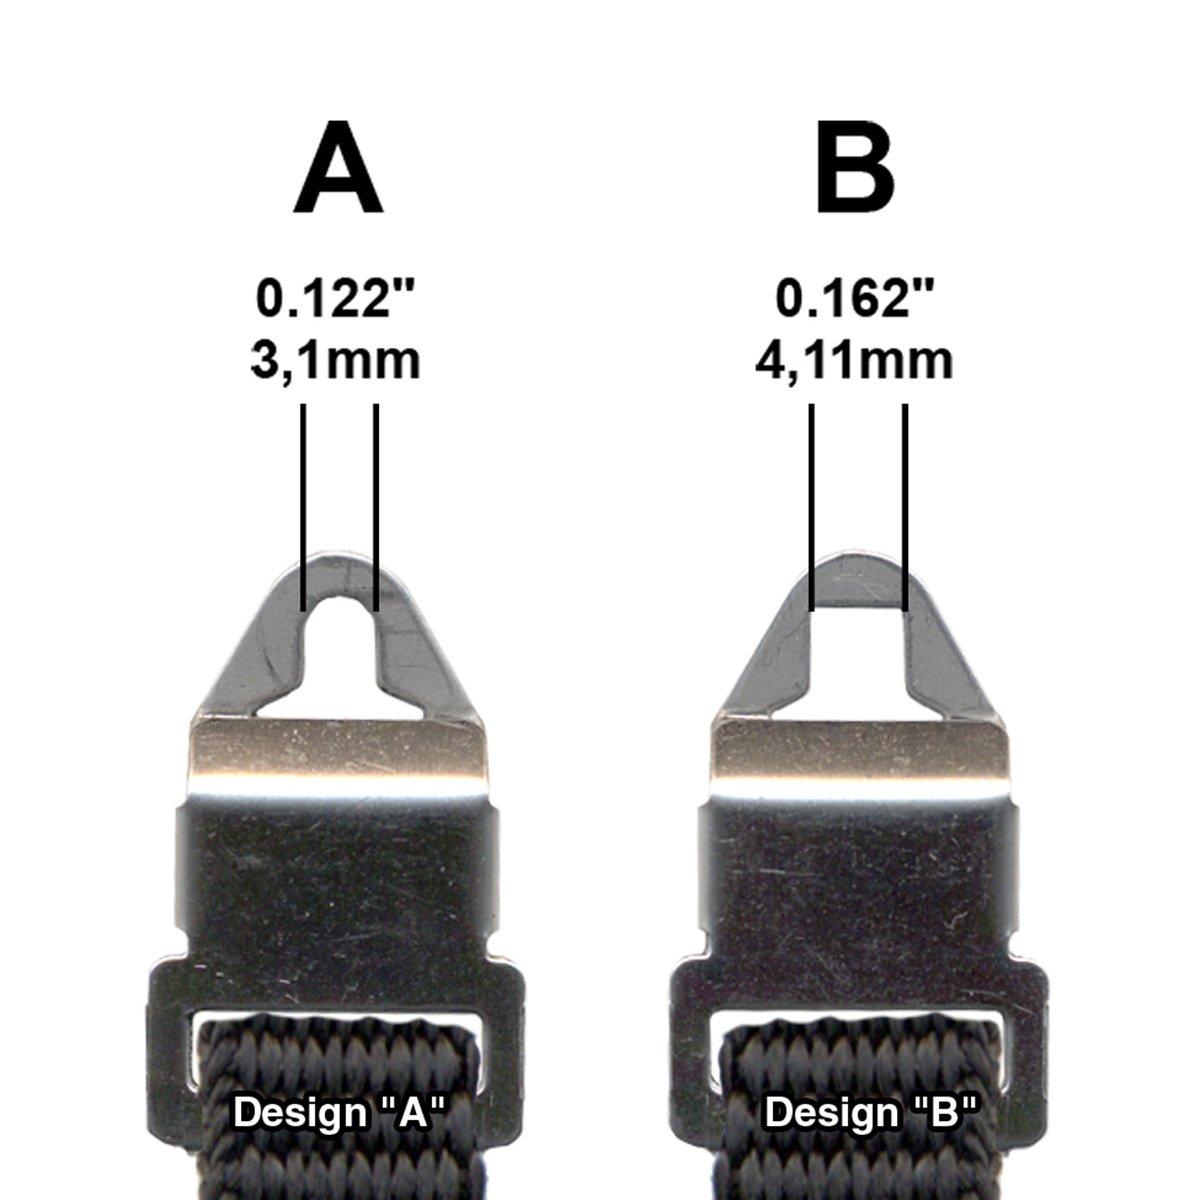 Op Tech Super Pro B Strap For Medium Fomat Cameras Kamera Modulatorsdemodulators Littlesoft Electronics